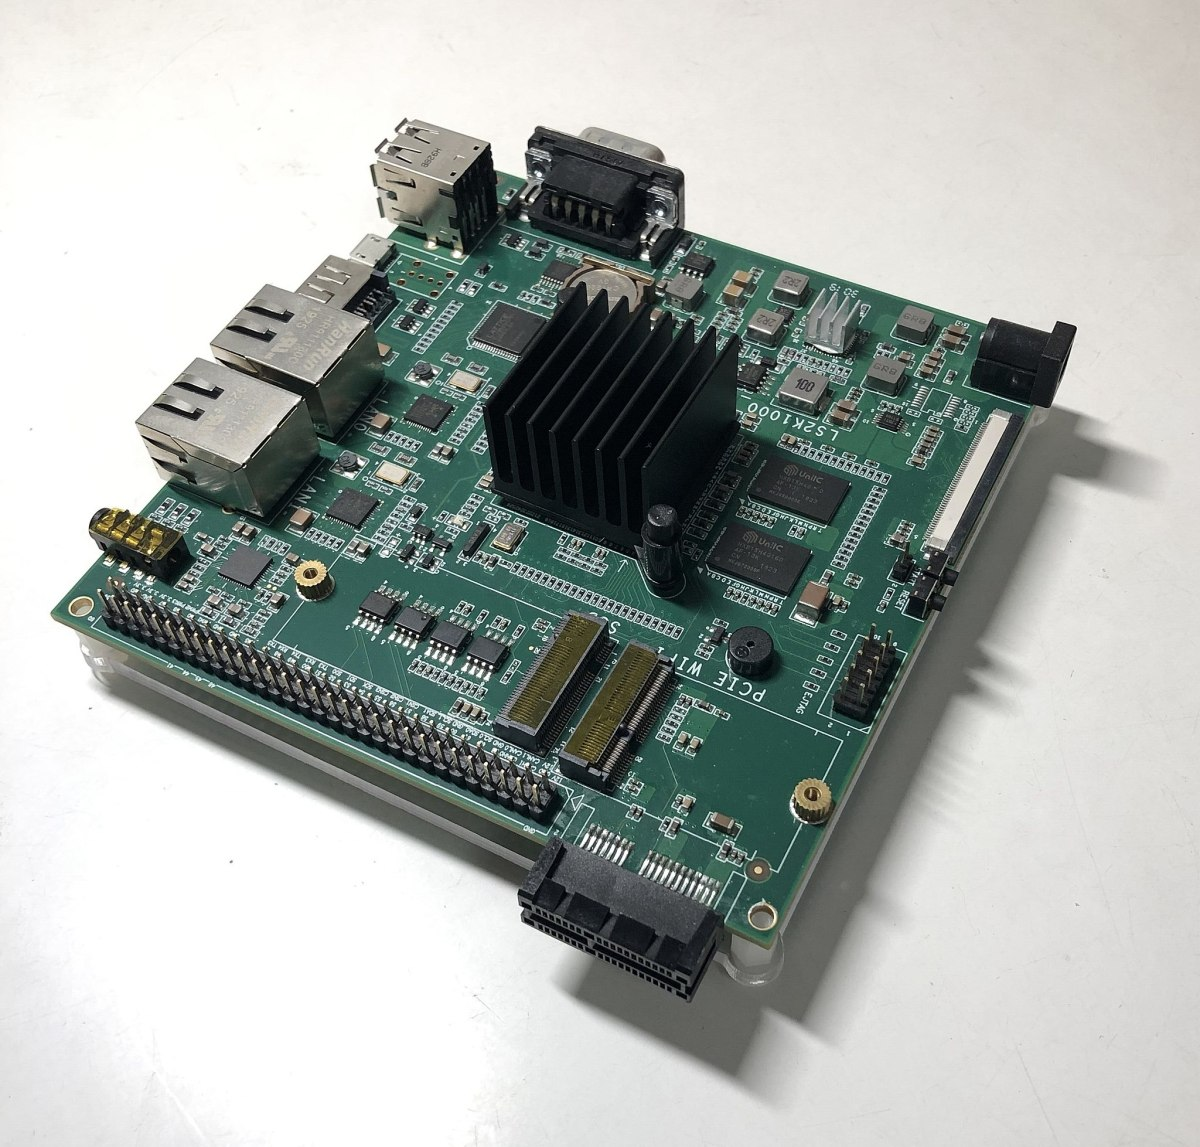 Longsoon Chips ISA semiconductors China government US x86